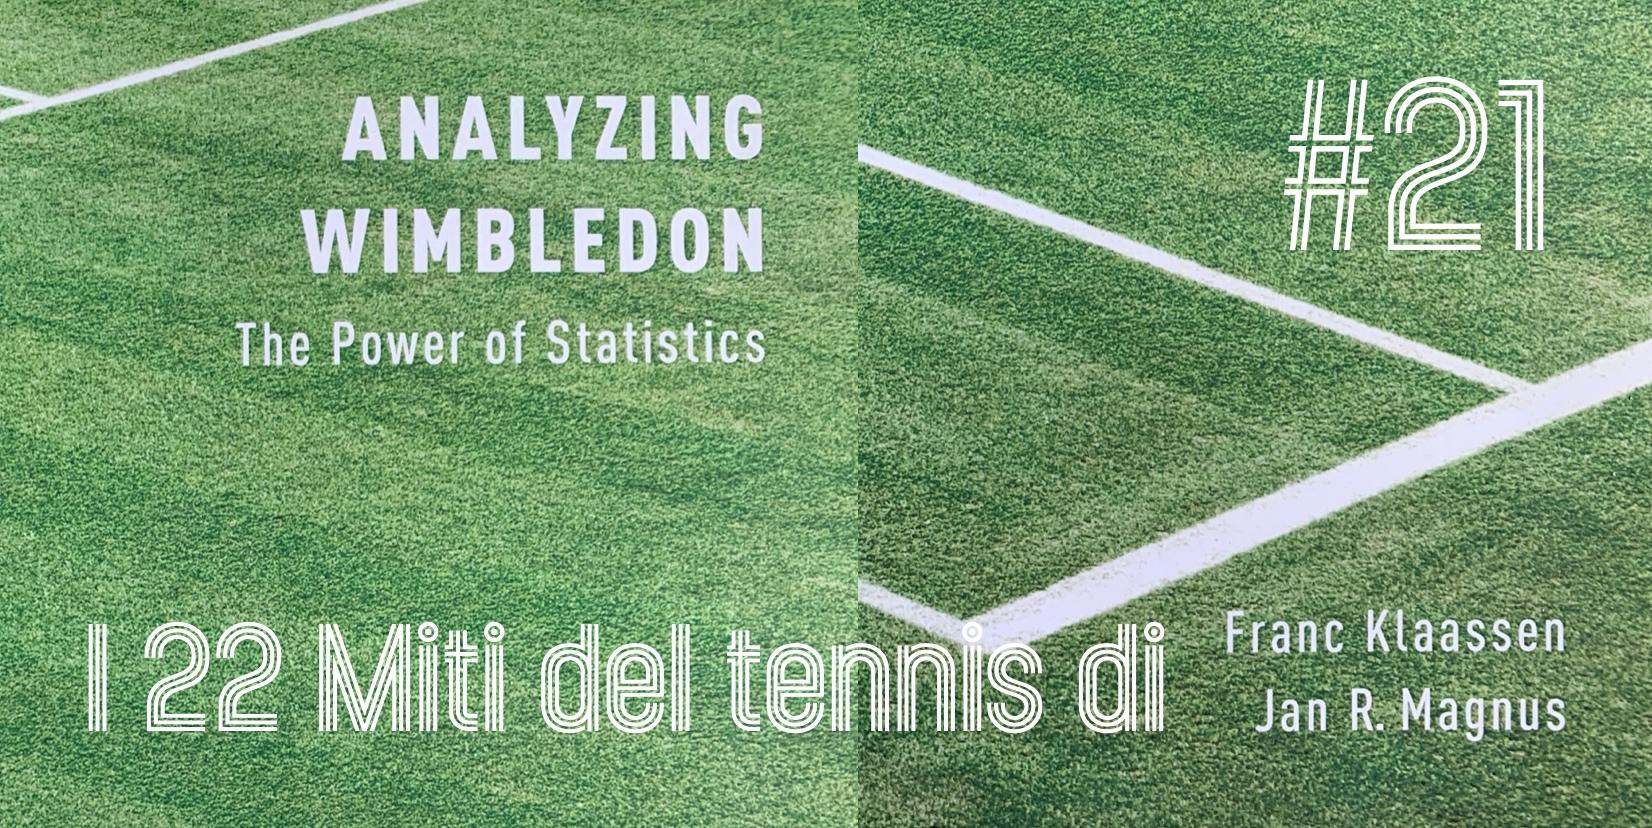 I 22 miti del tennis di Klaassen & Magnus – Mito 21 - settesei.it